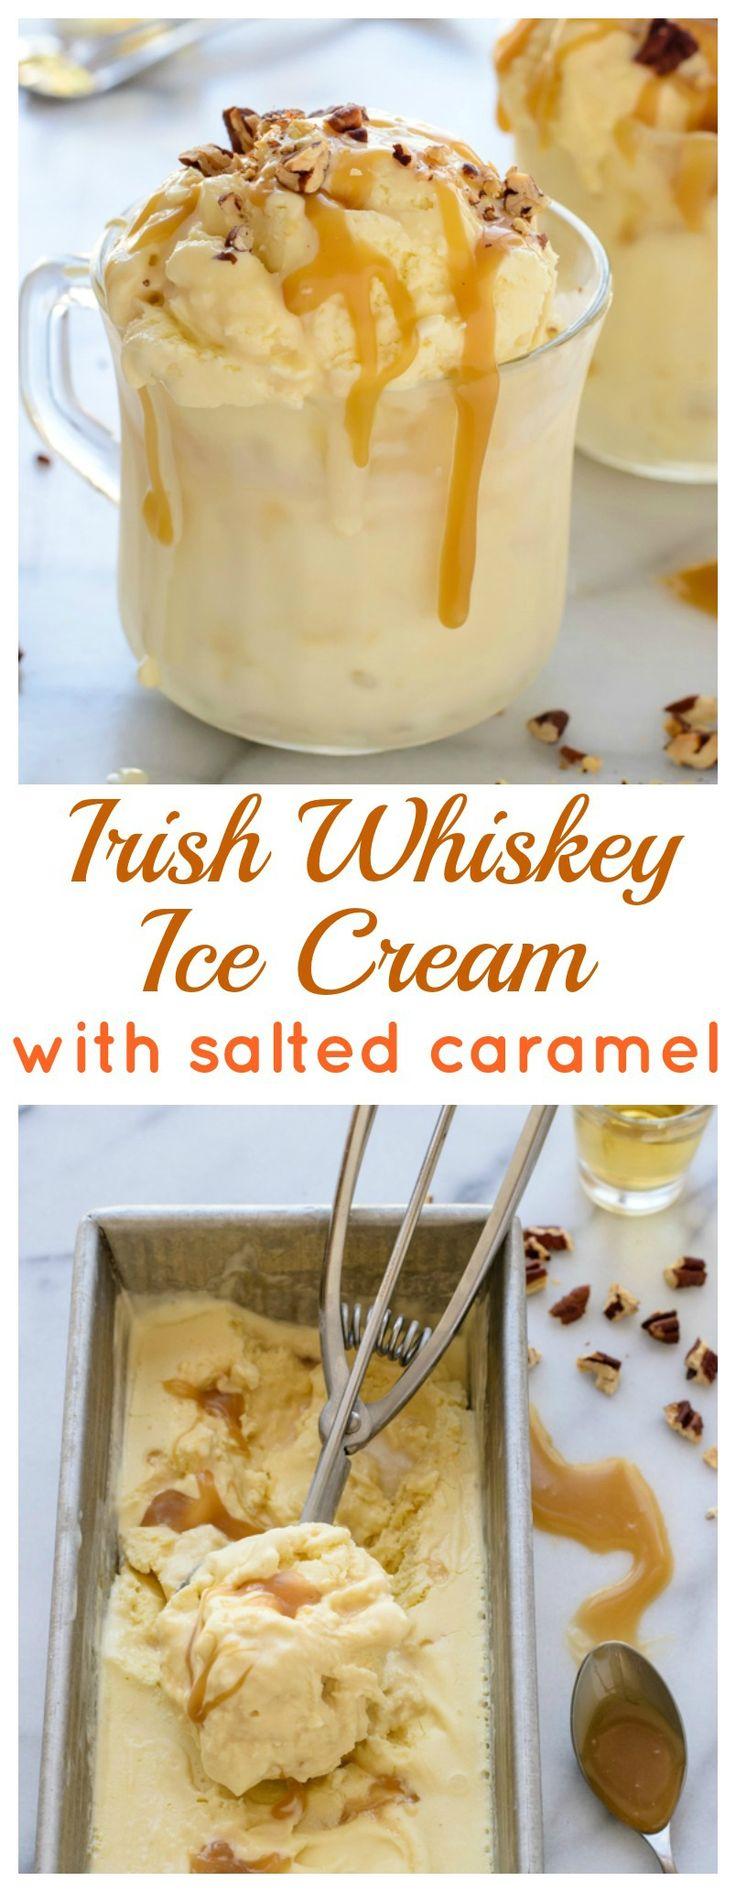 Irish Whiskey Ice Cream with Salted Caramel Sauce. Warning: it's BOOZY. Must make for #stpatricksday !